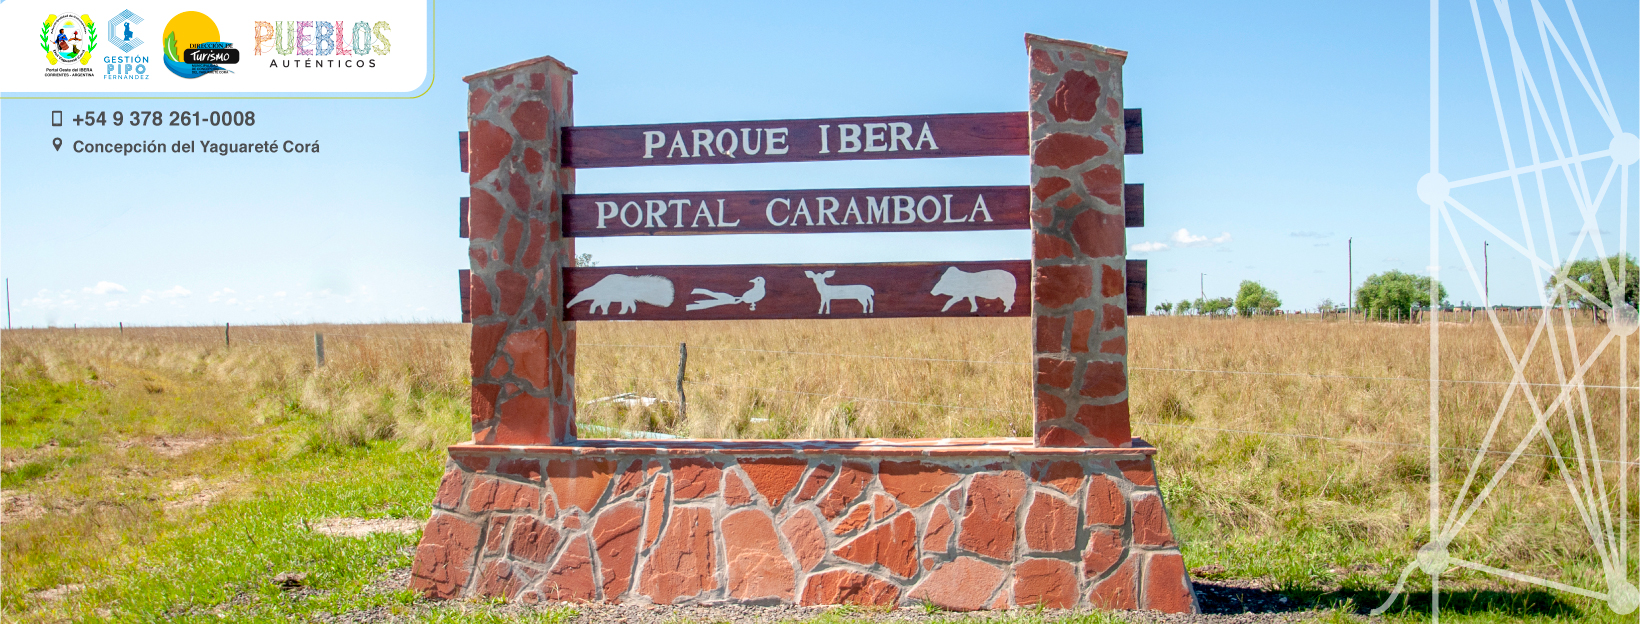 Parque Iberá - Portal Carambola